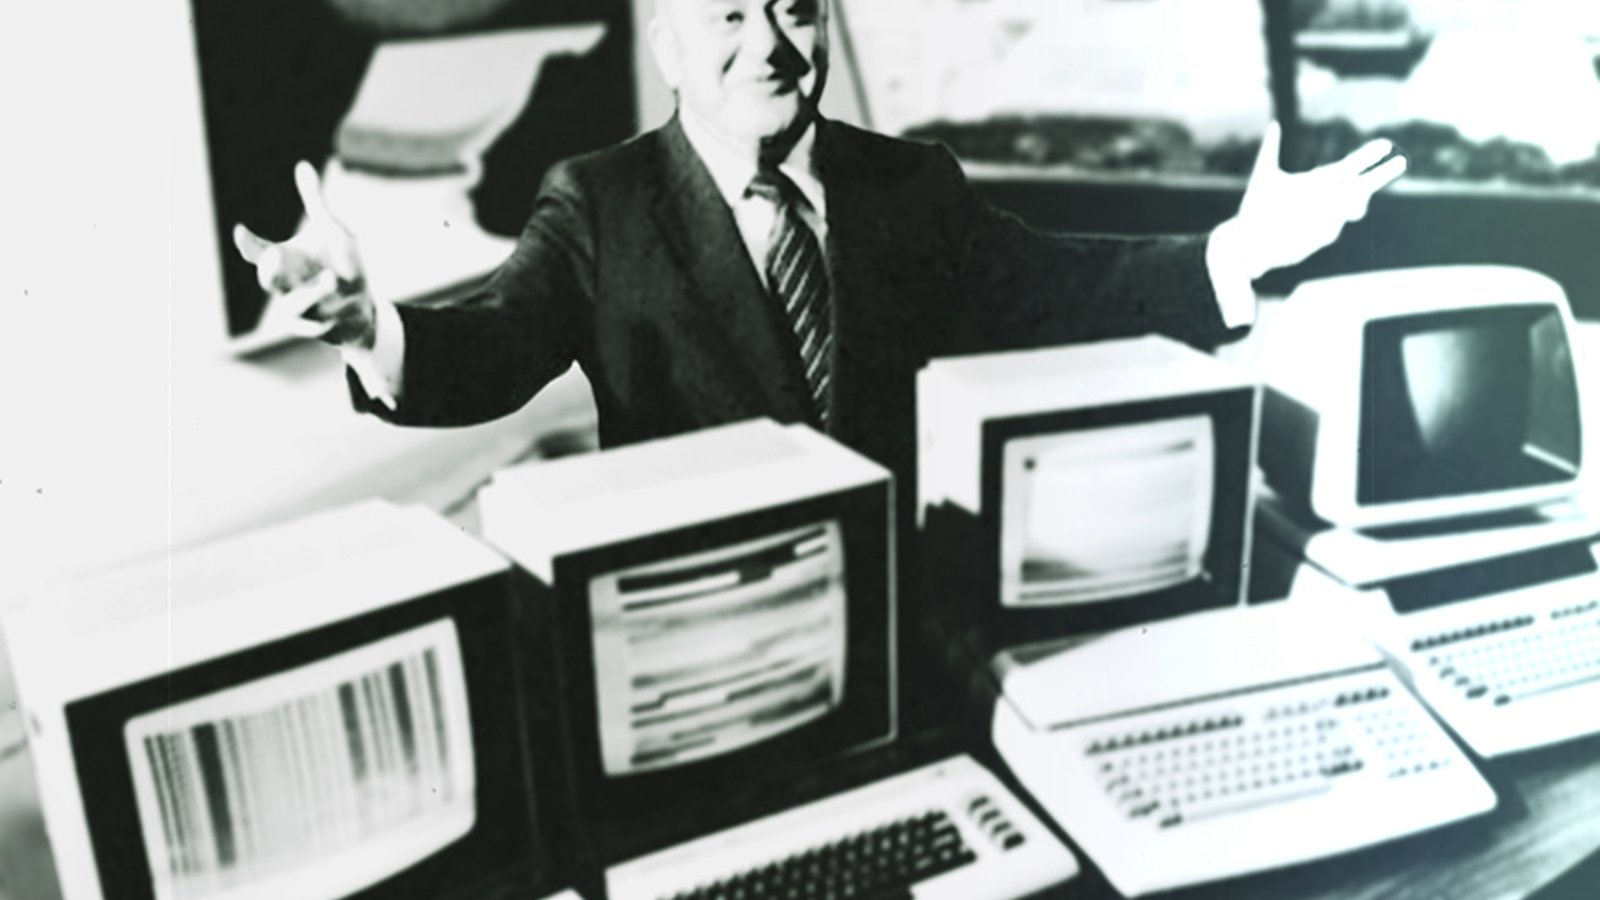 8 Bit Generation - The Commodore Computer Wars